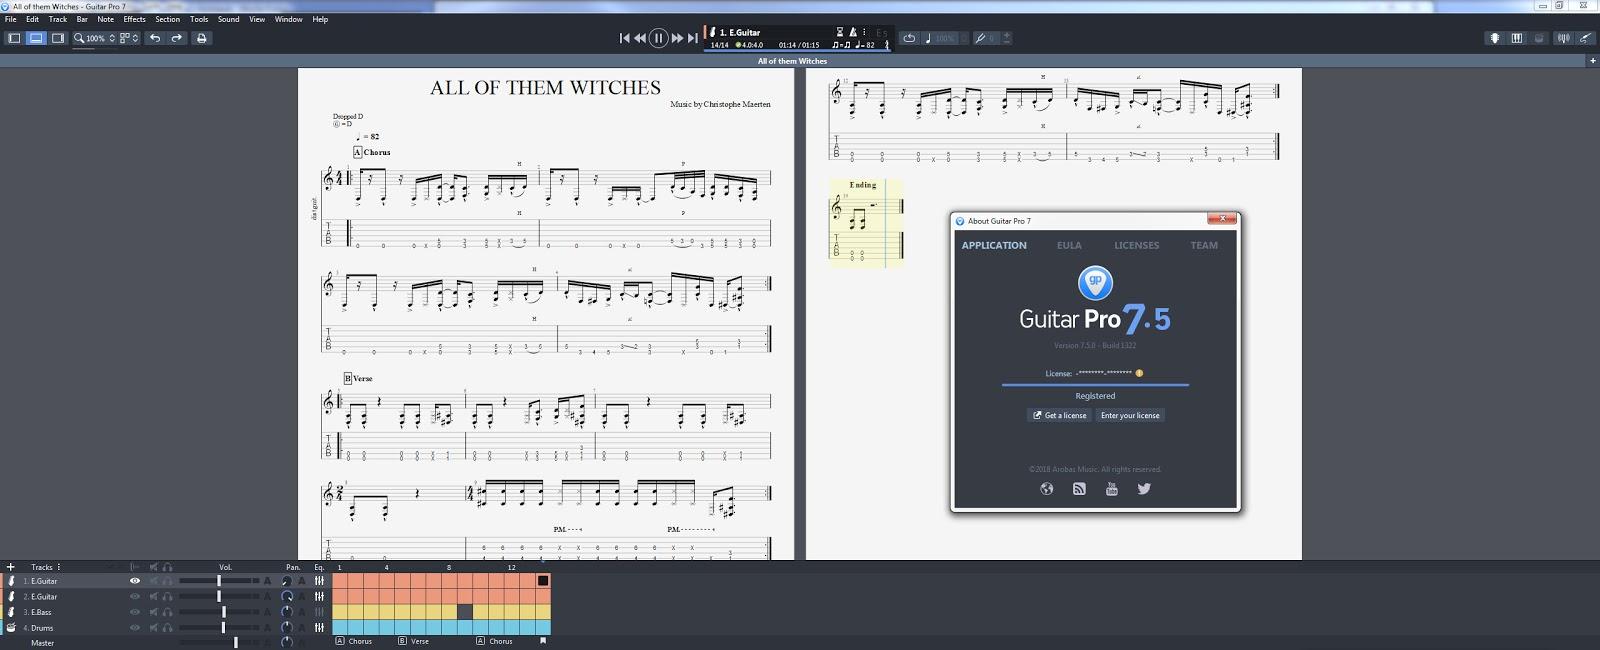 Guitar Pro v7.5.2 Build 1586 + Soundbanks Full version